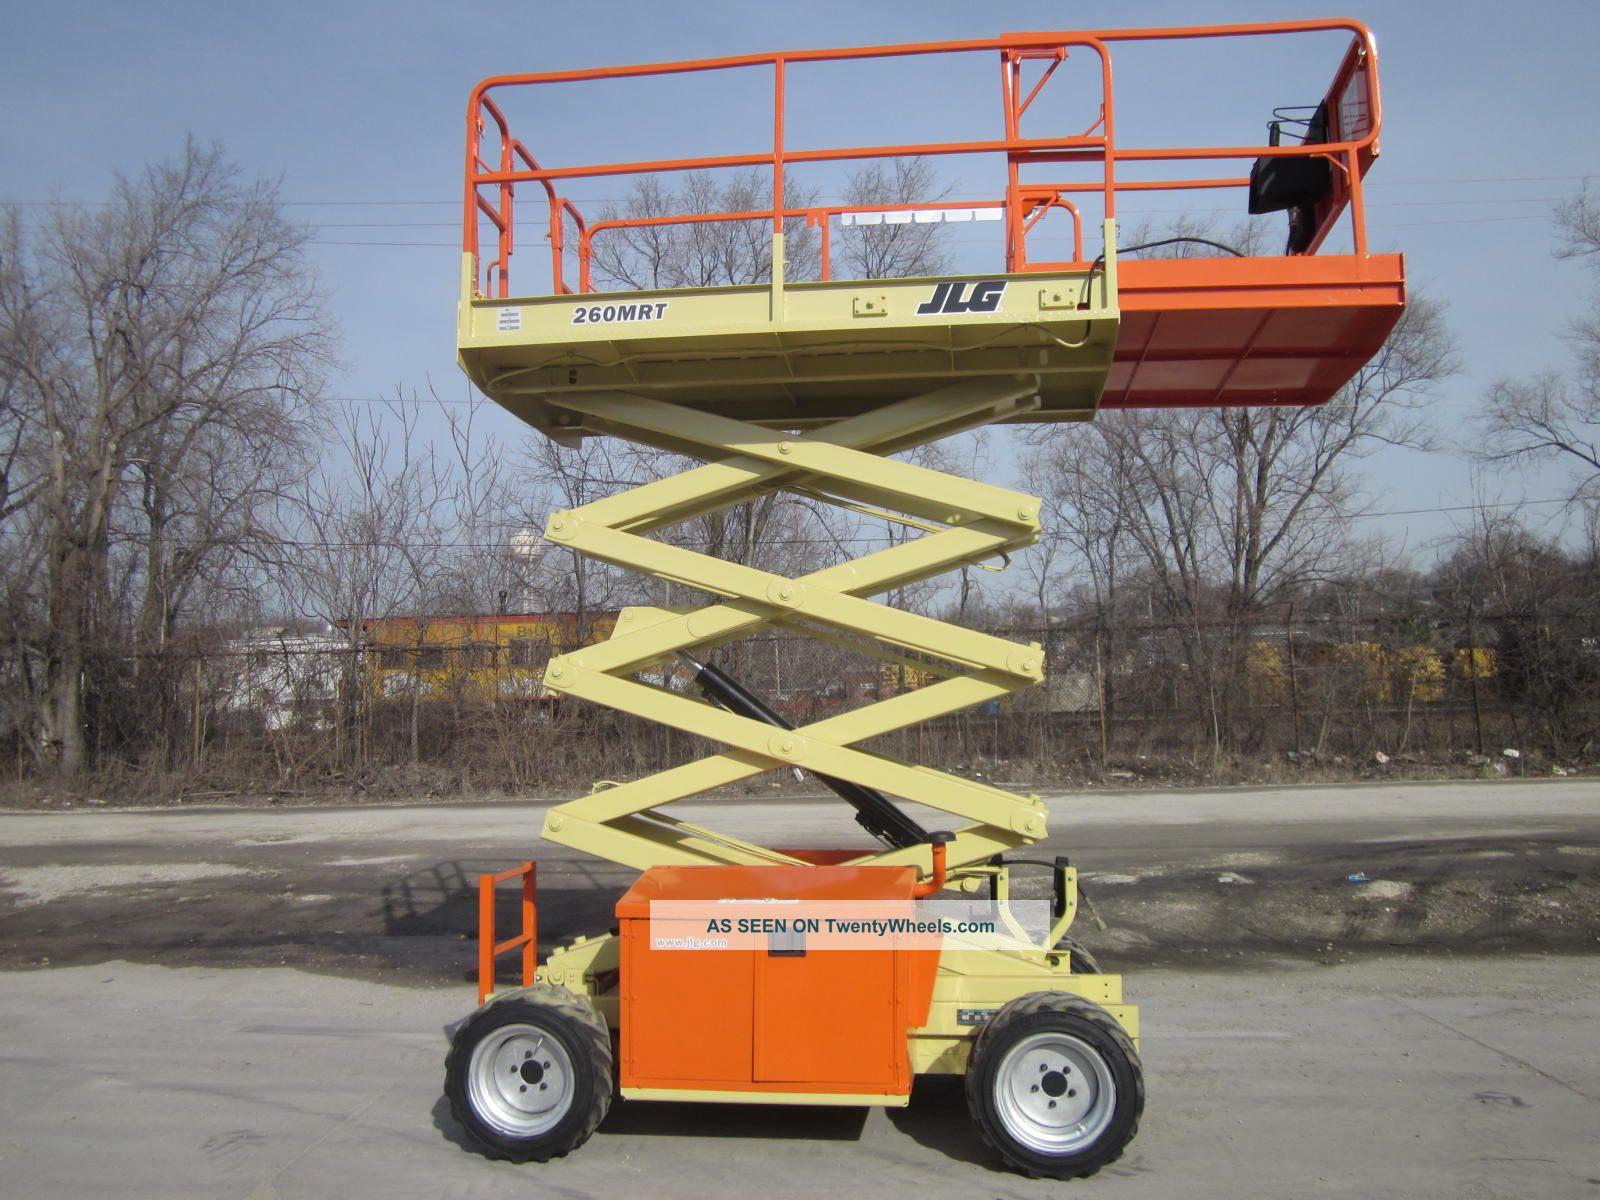 2004 Jlg 260mrt 4x4 Scissor Lift Manlift Boom Aerial